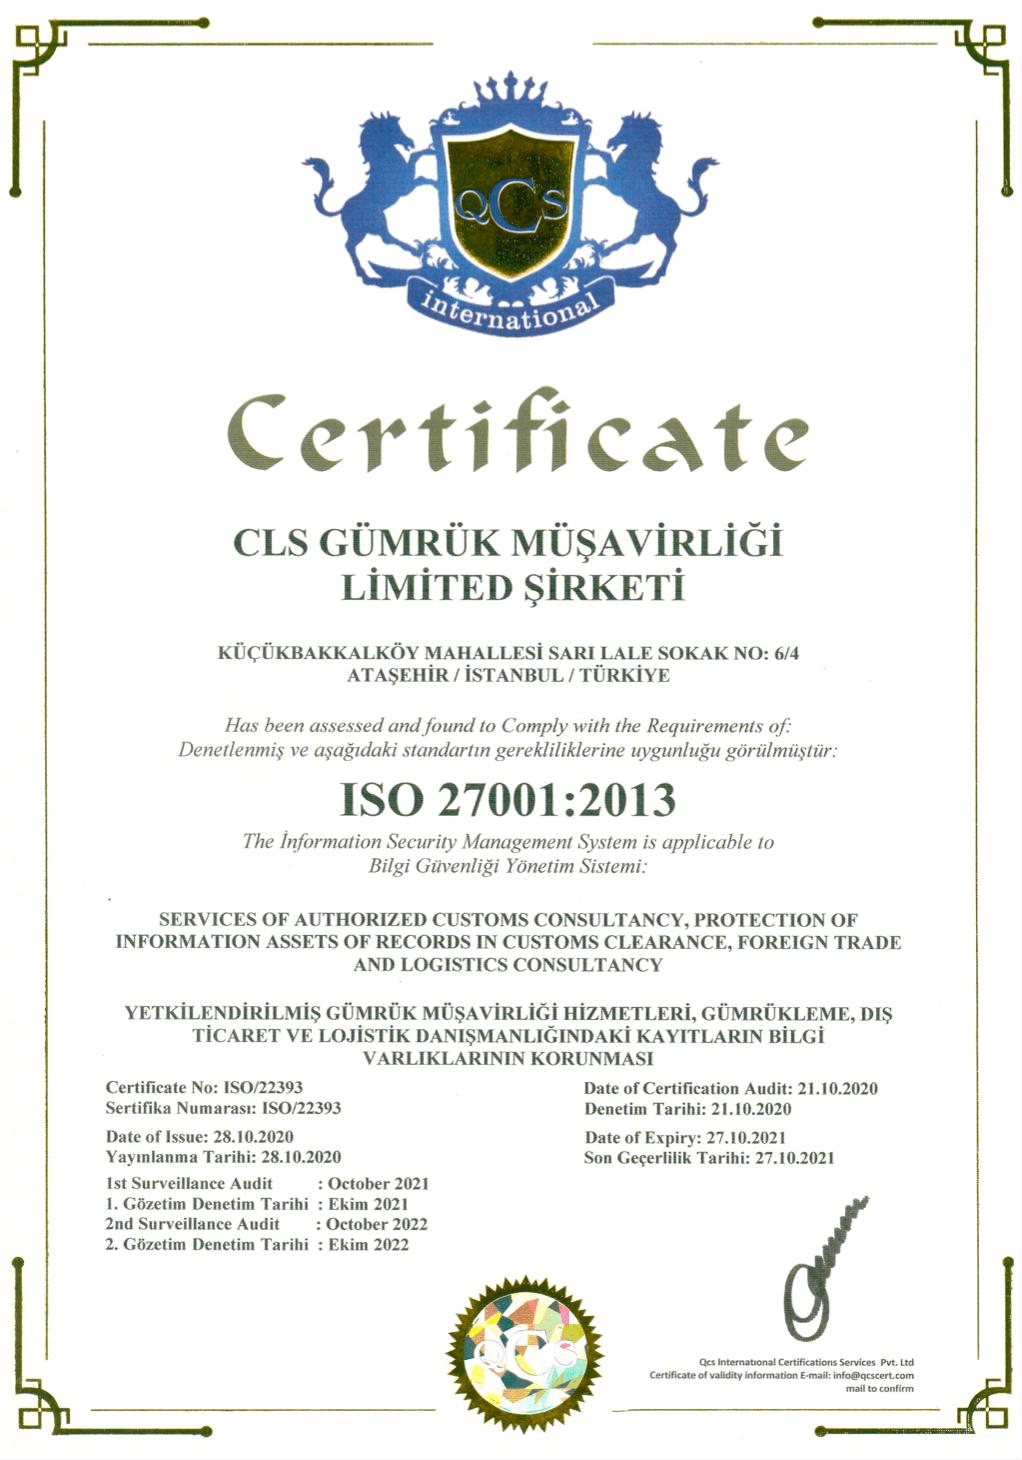 sertifika1a